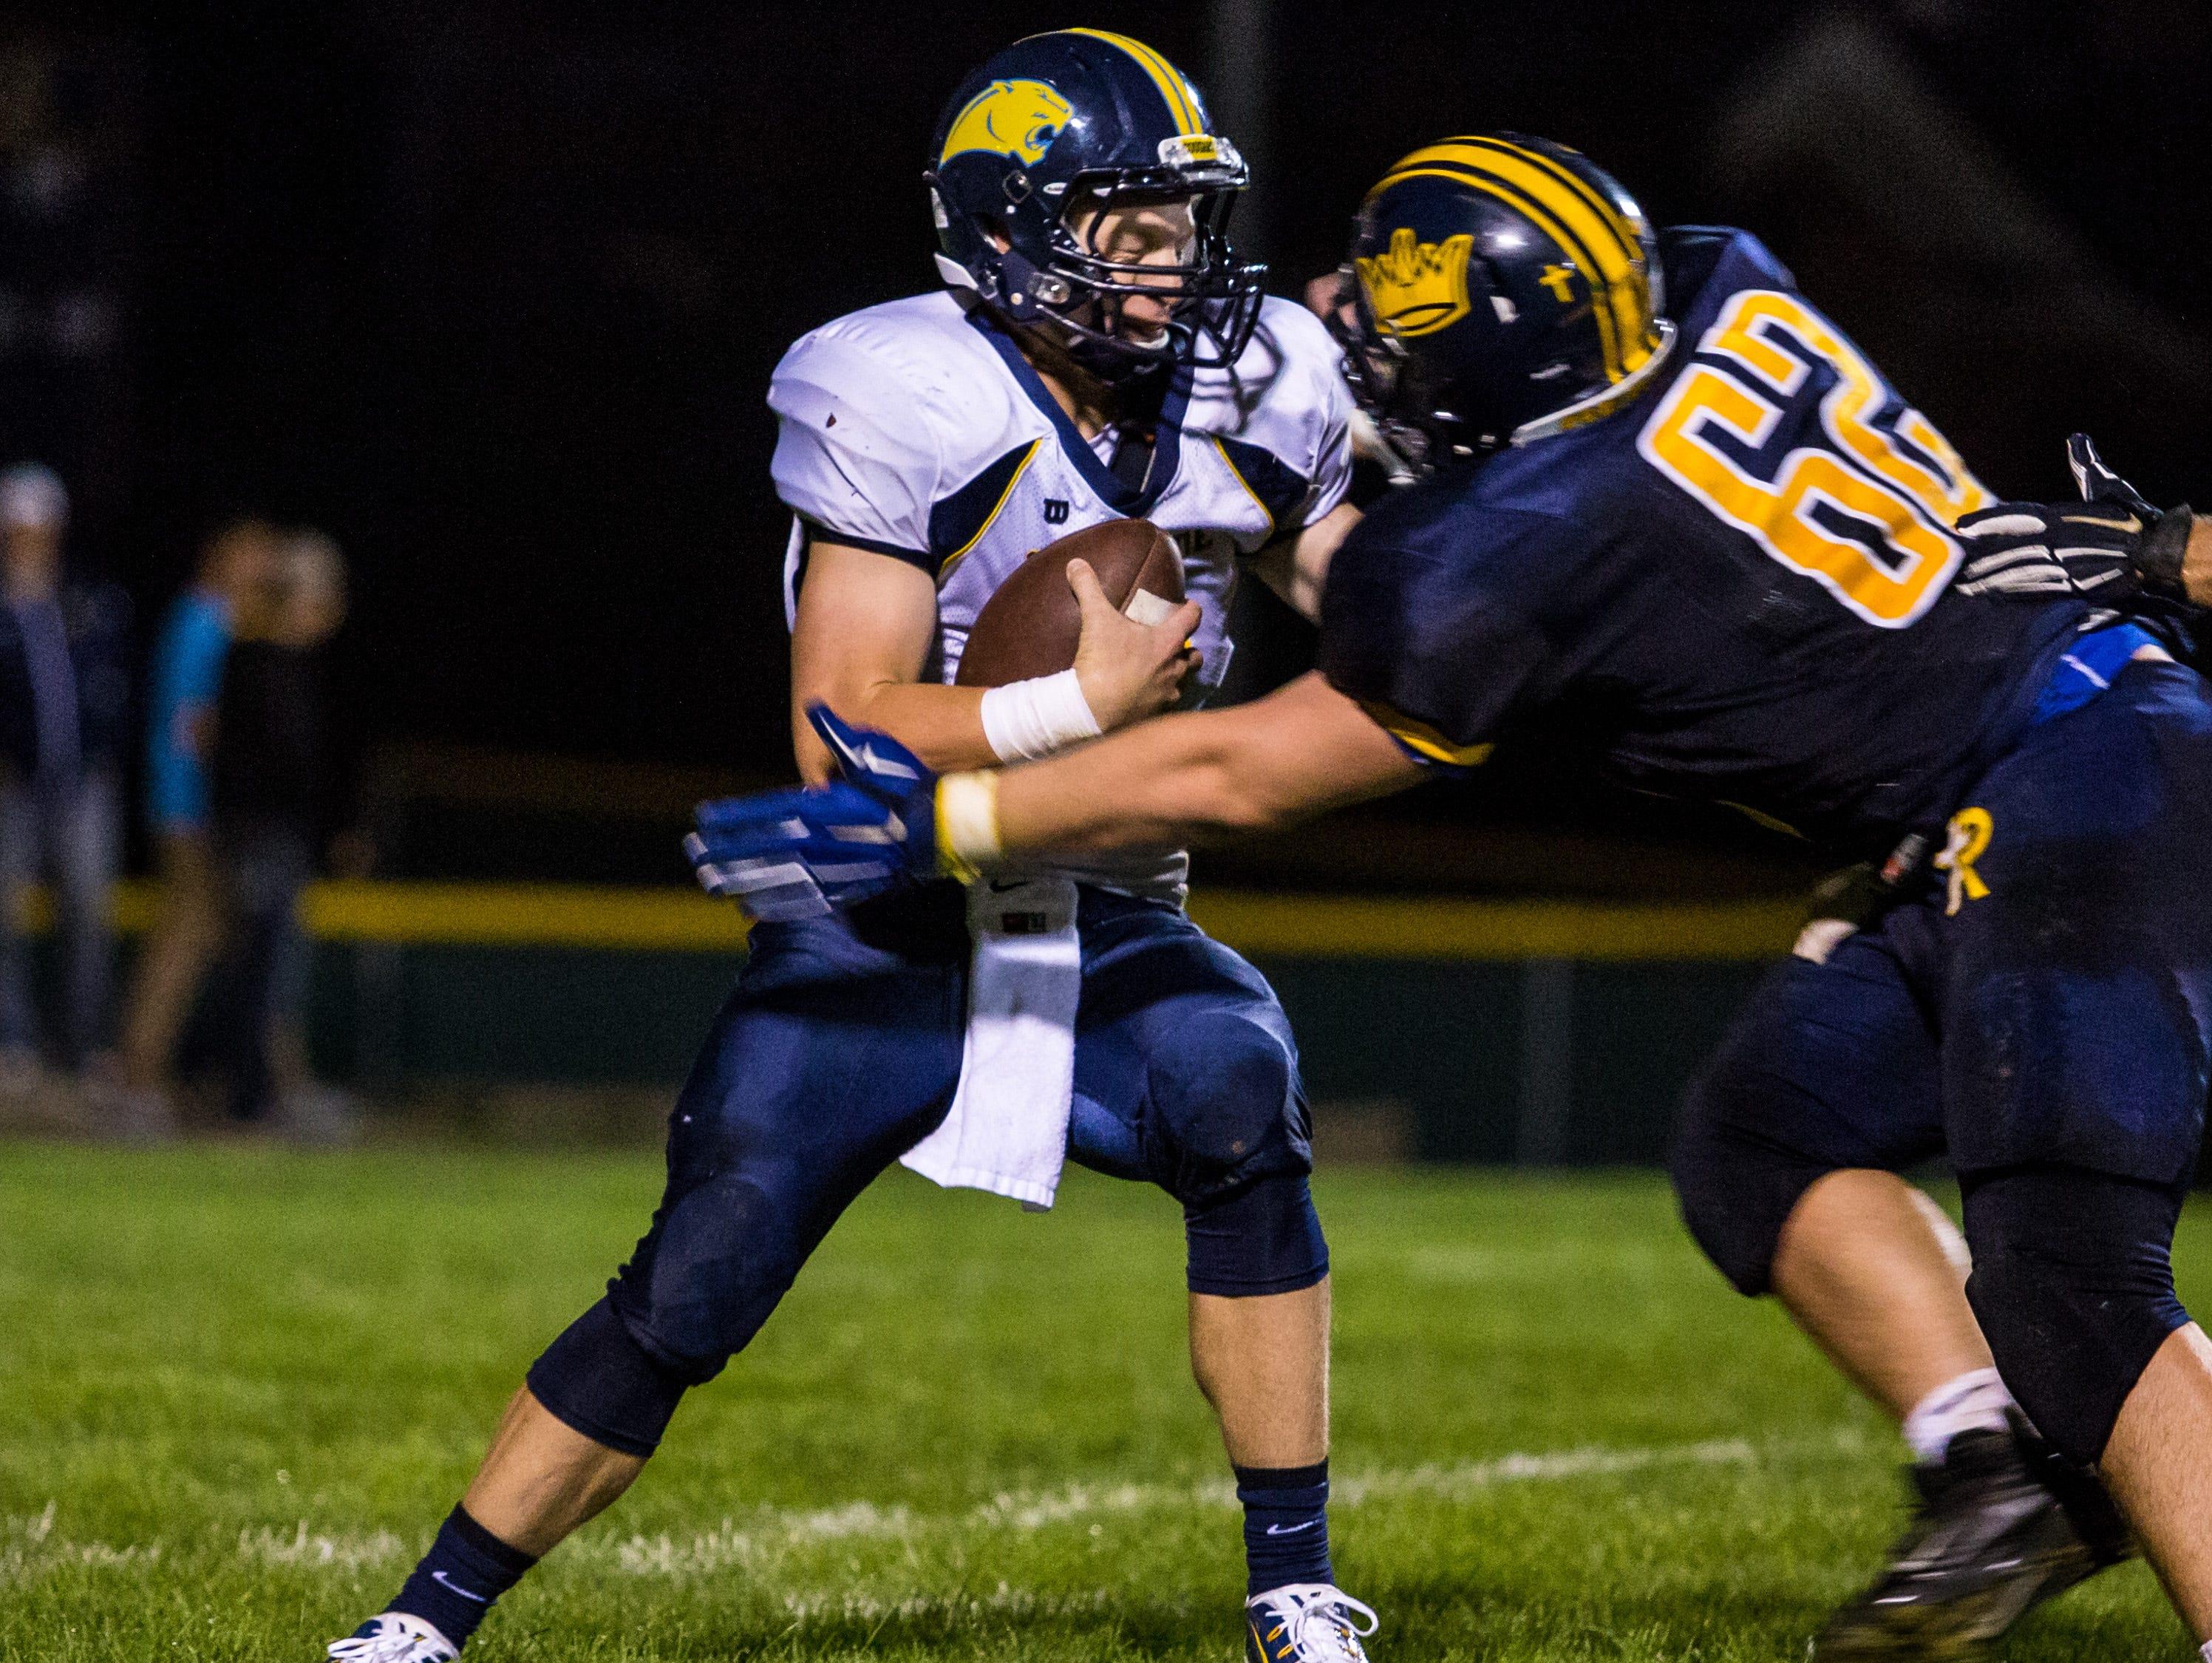 Iowa City Regina's Jared Brinkman makes a tackle against Cascade last year.